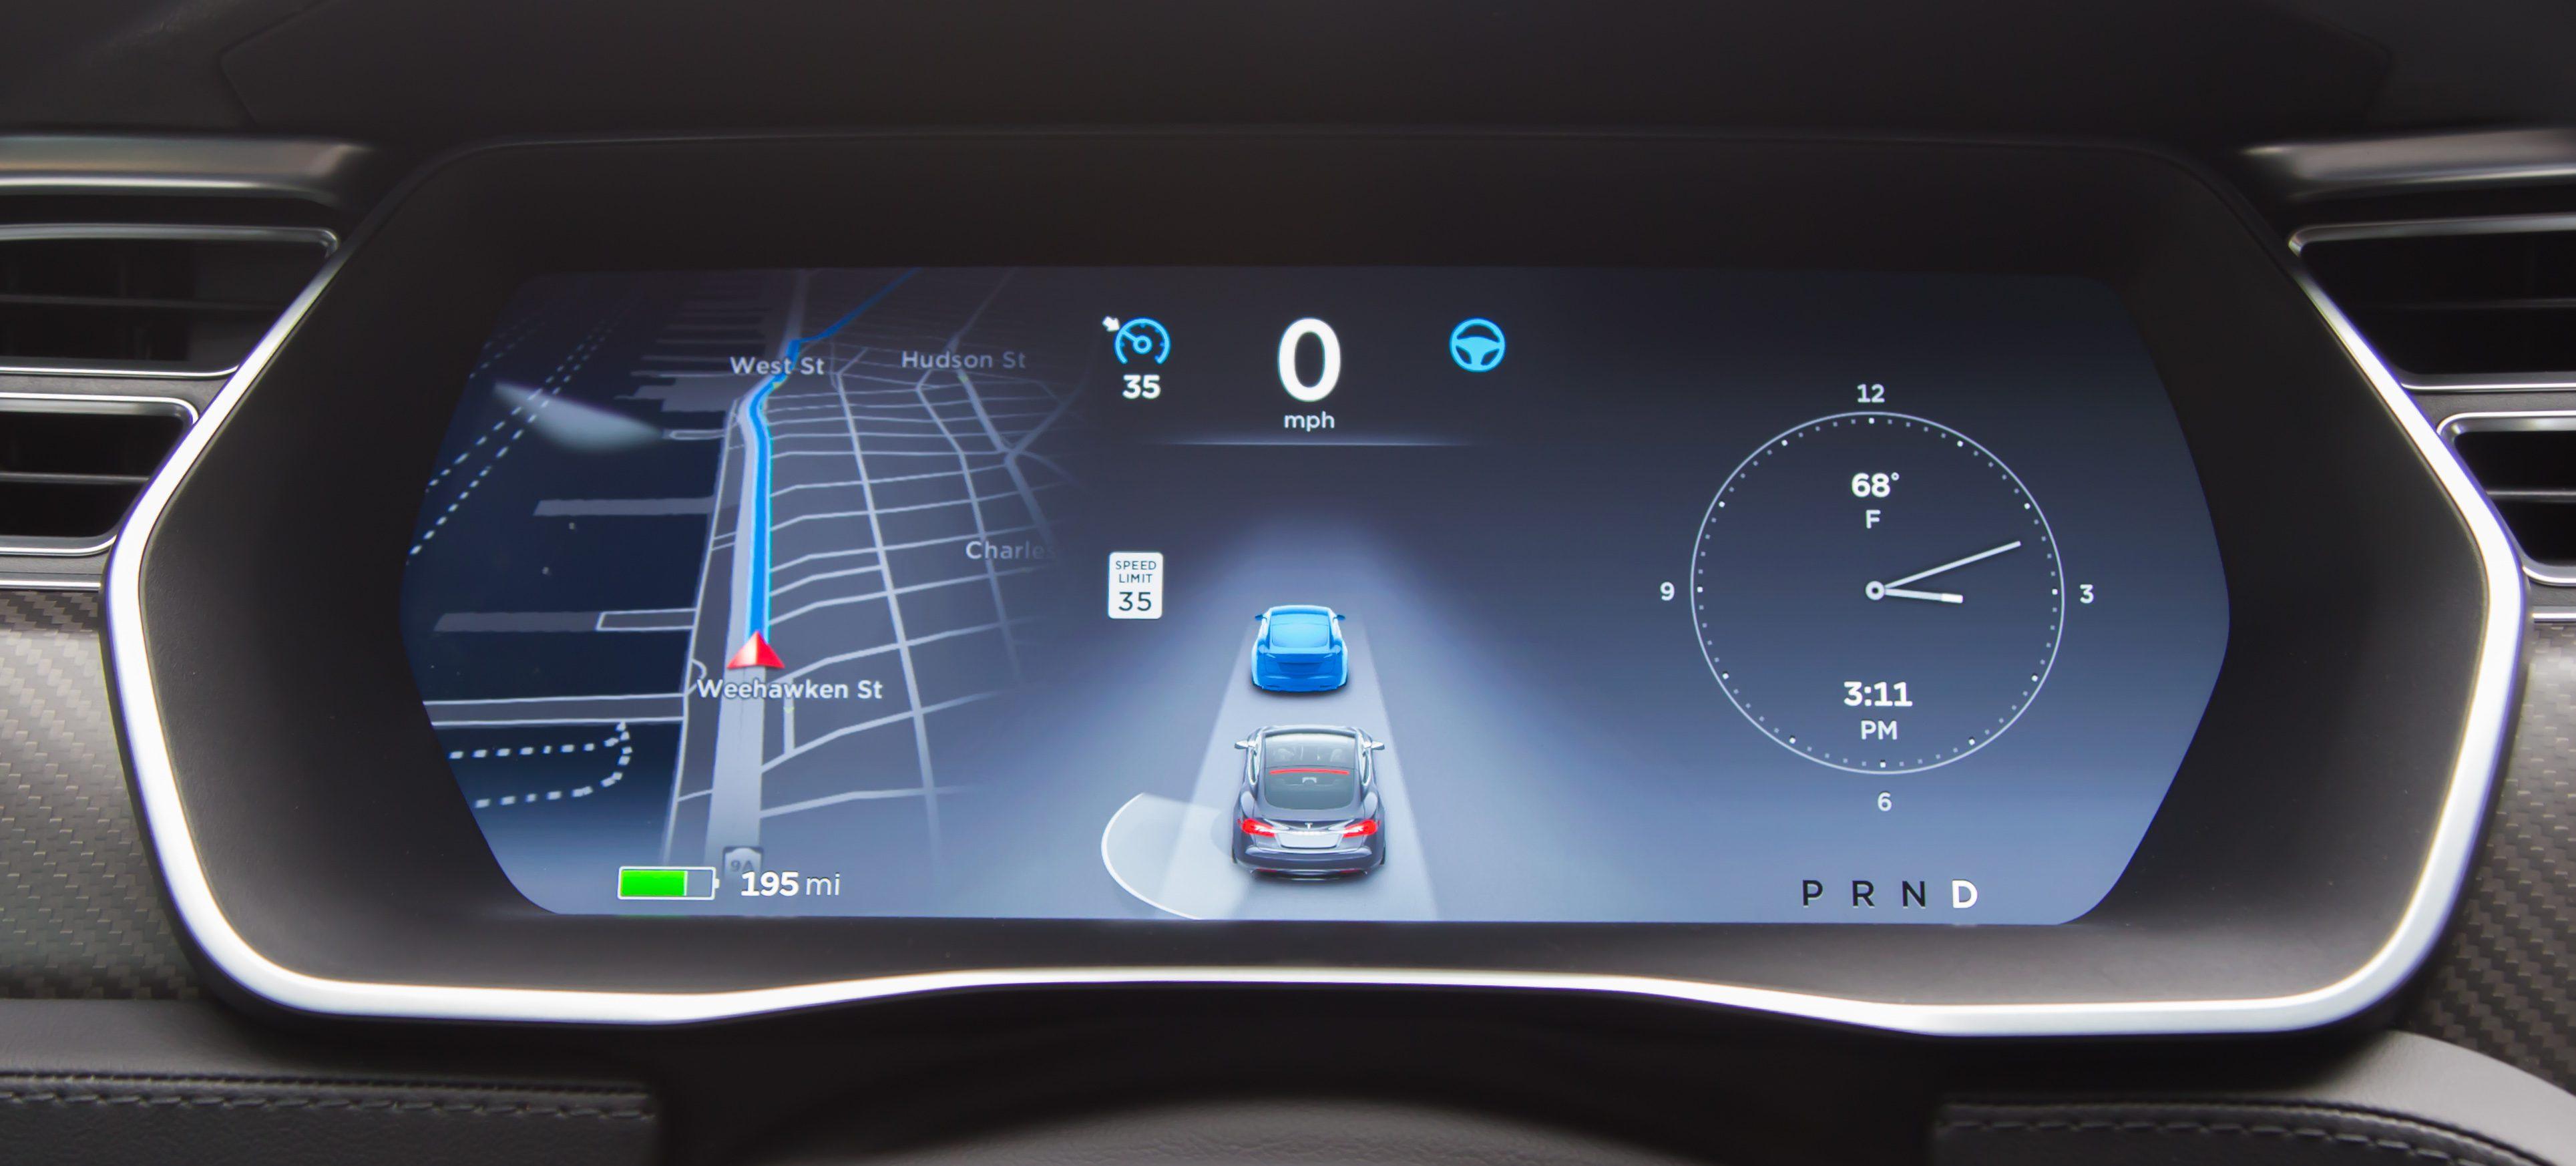 tesla-autopilot-tracking